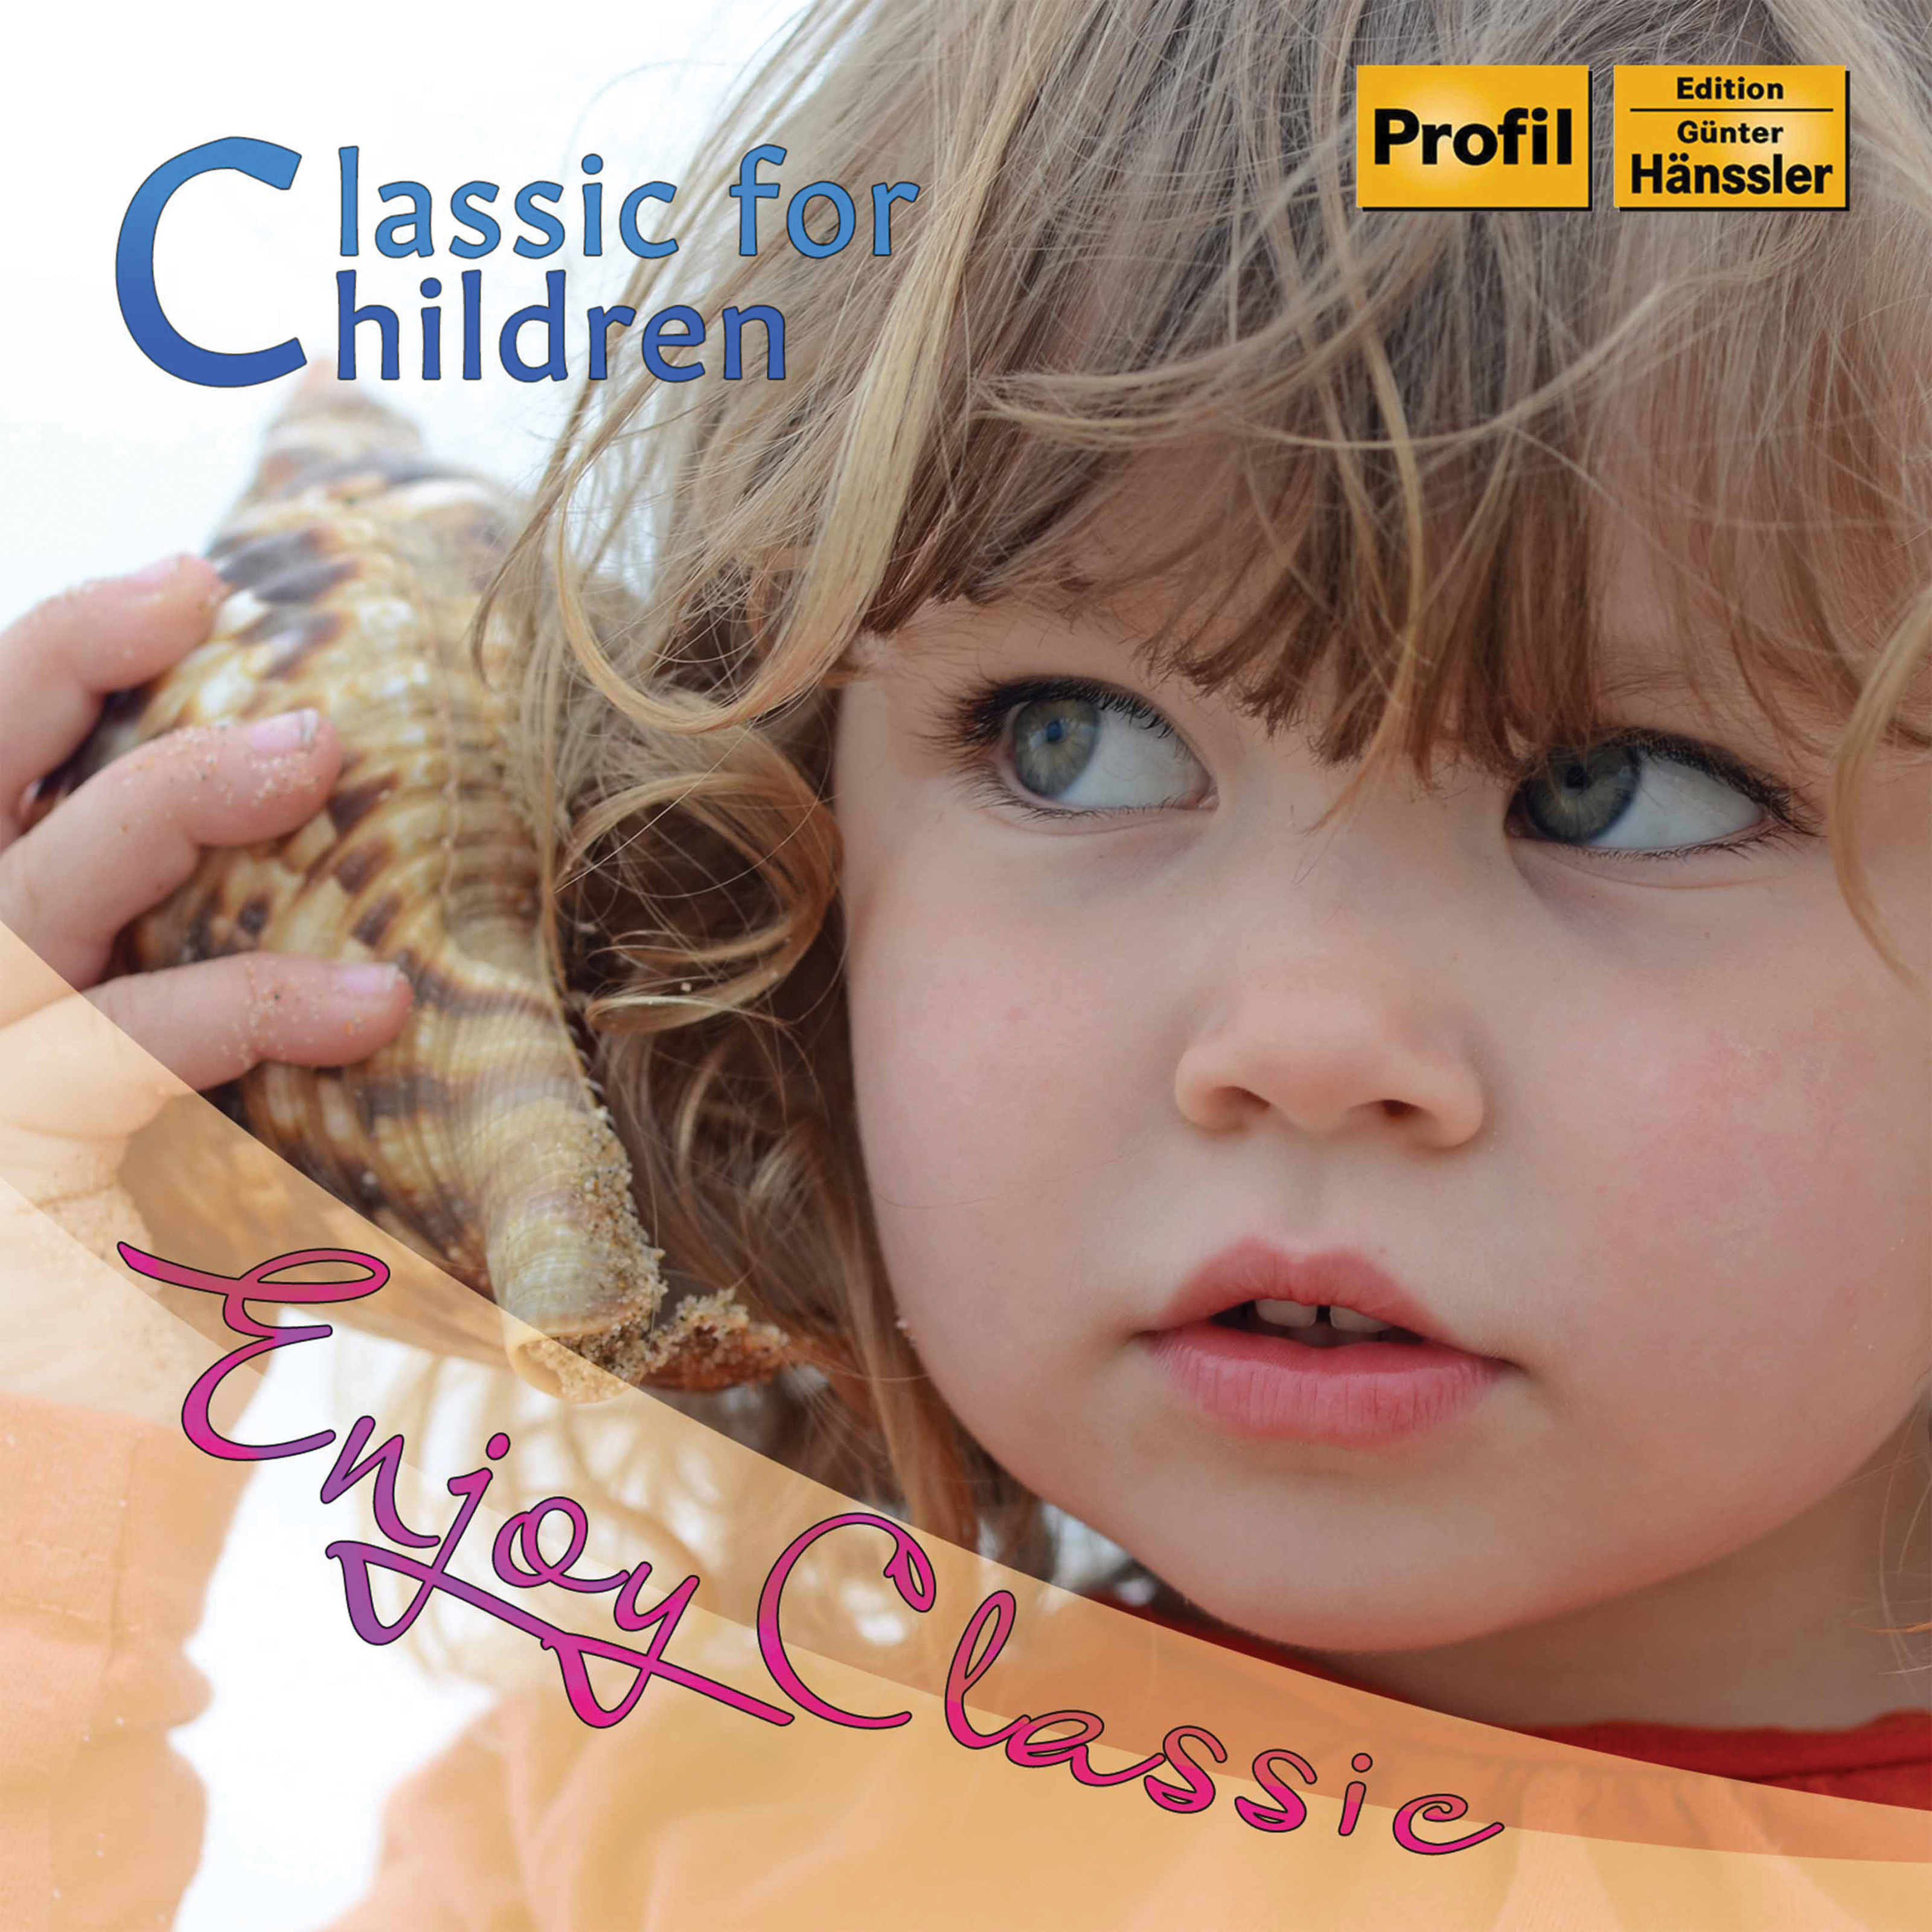 Classic for Children